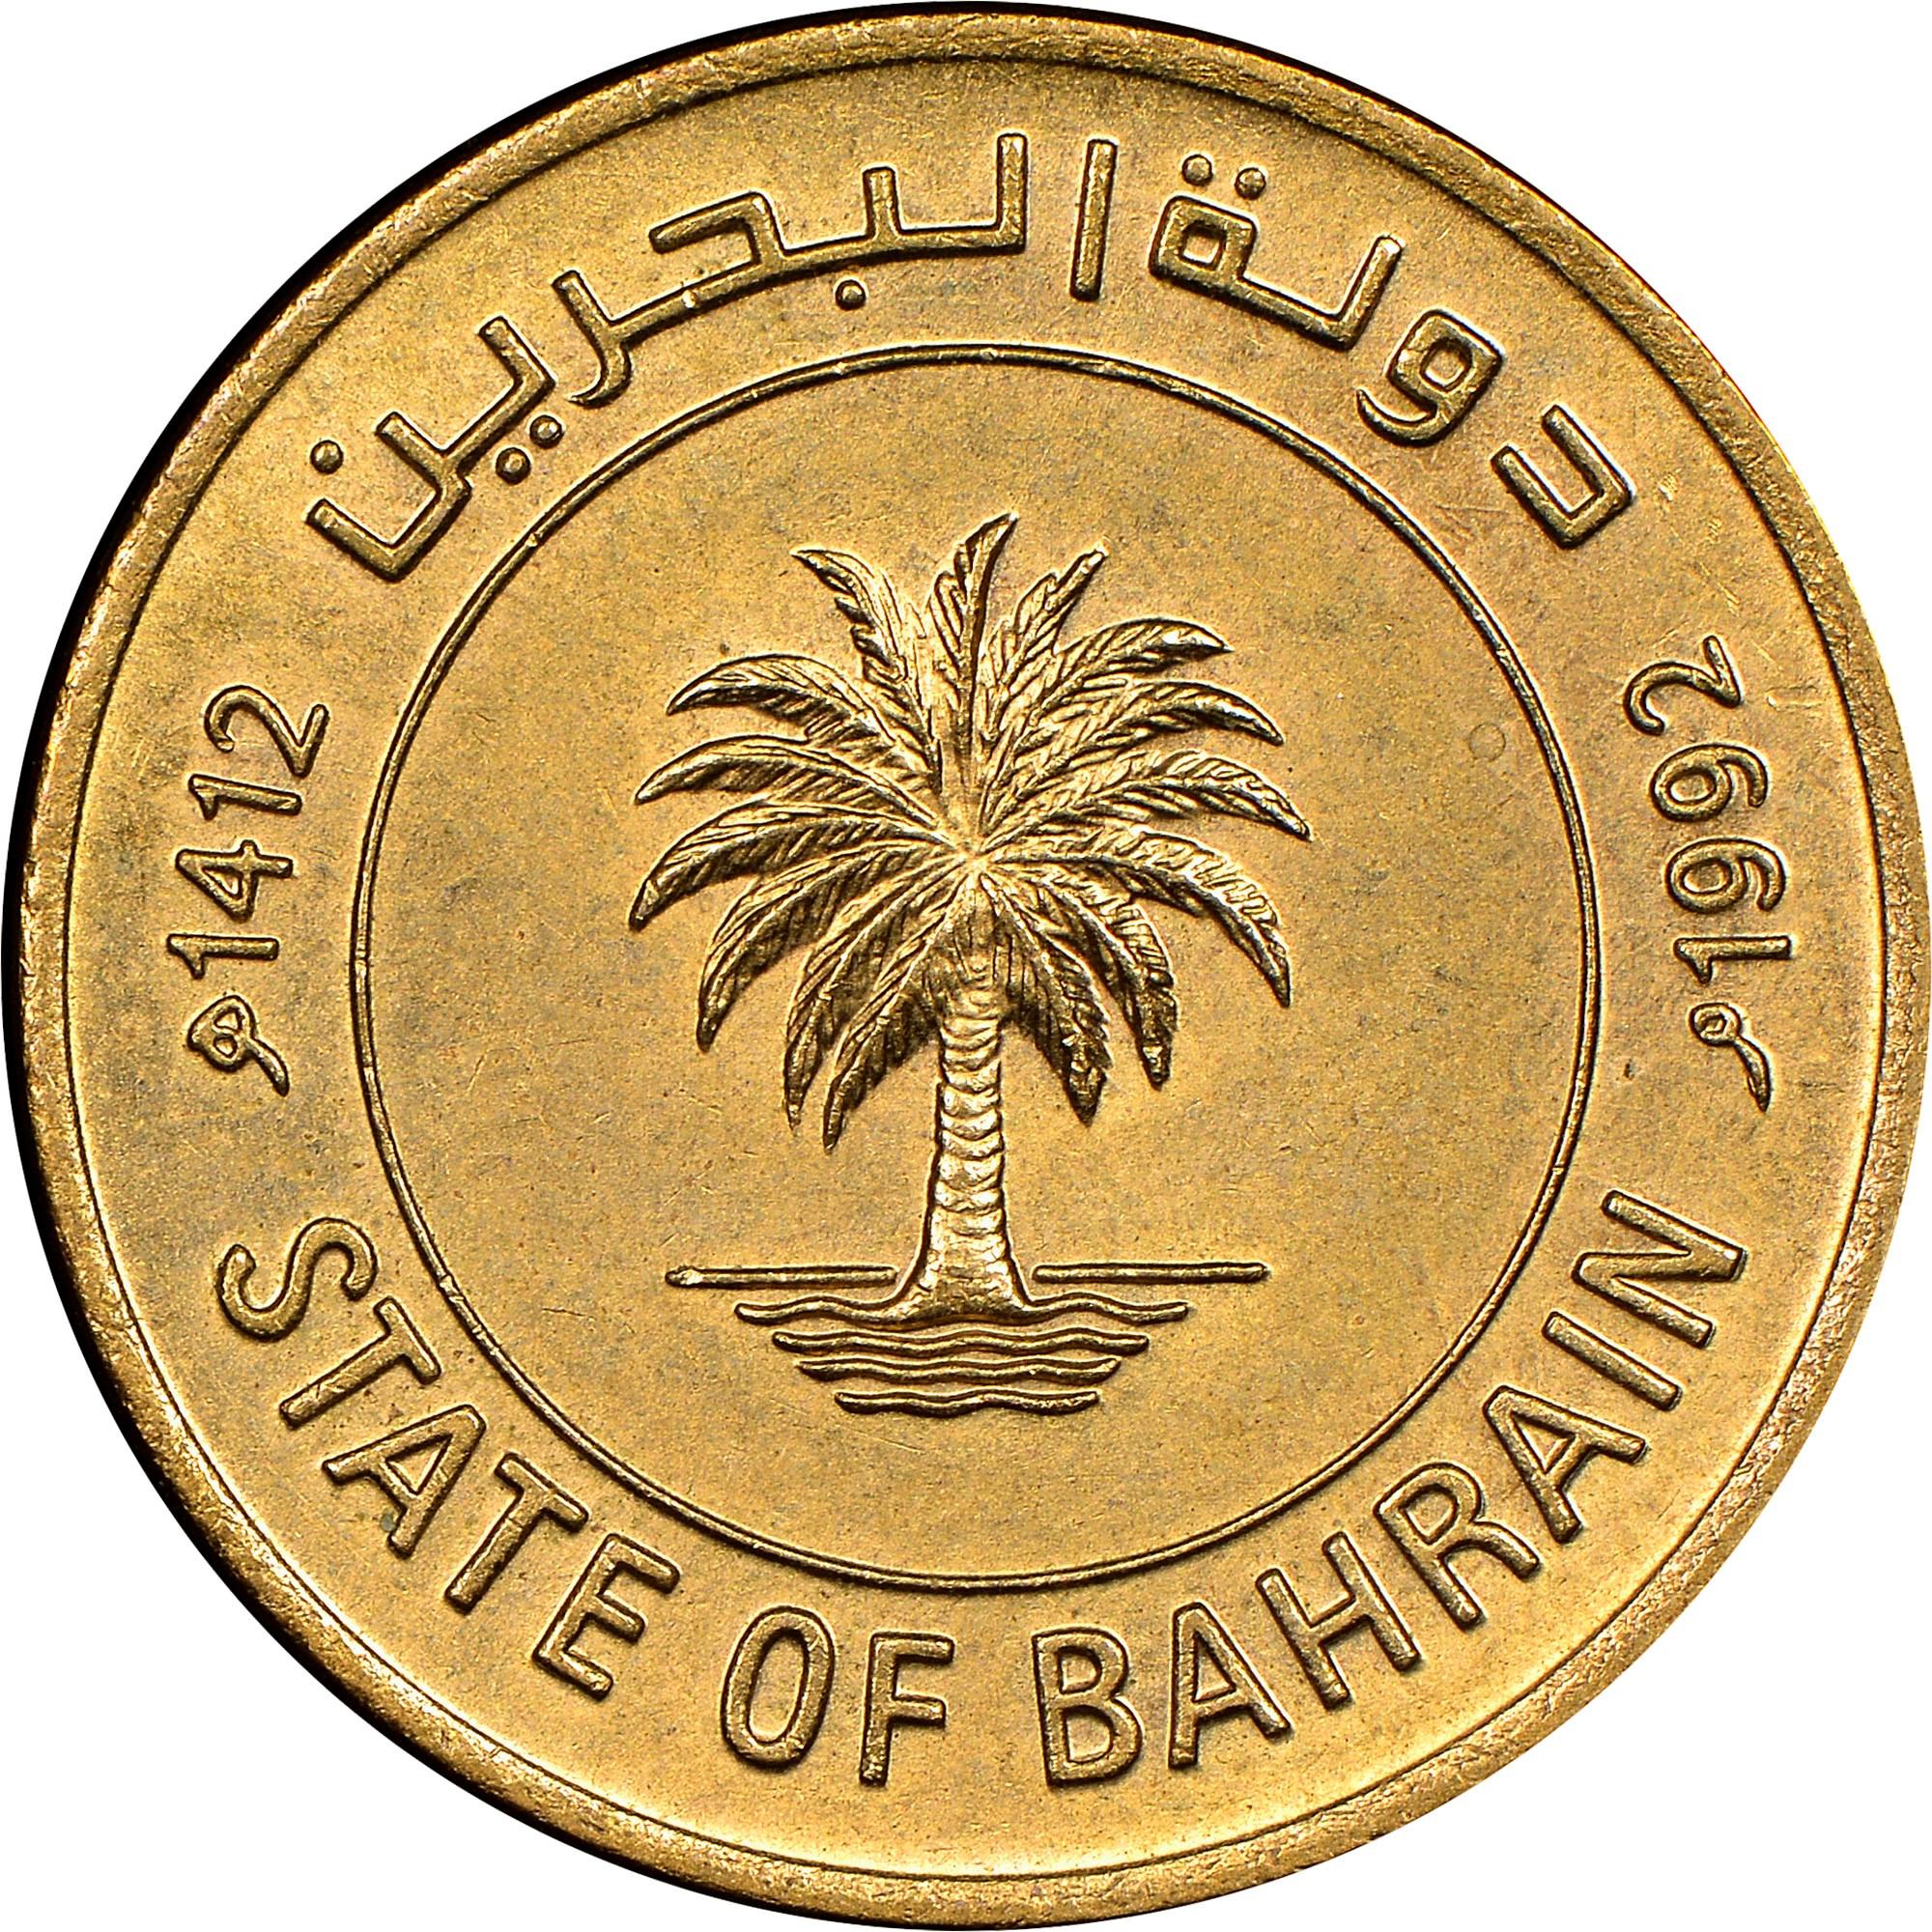 Bahrain 5 Fils obverse